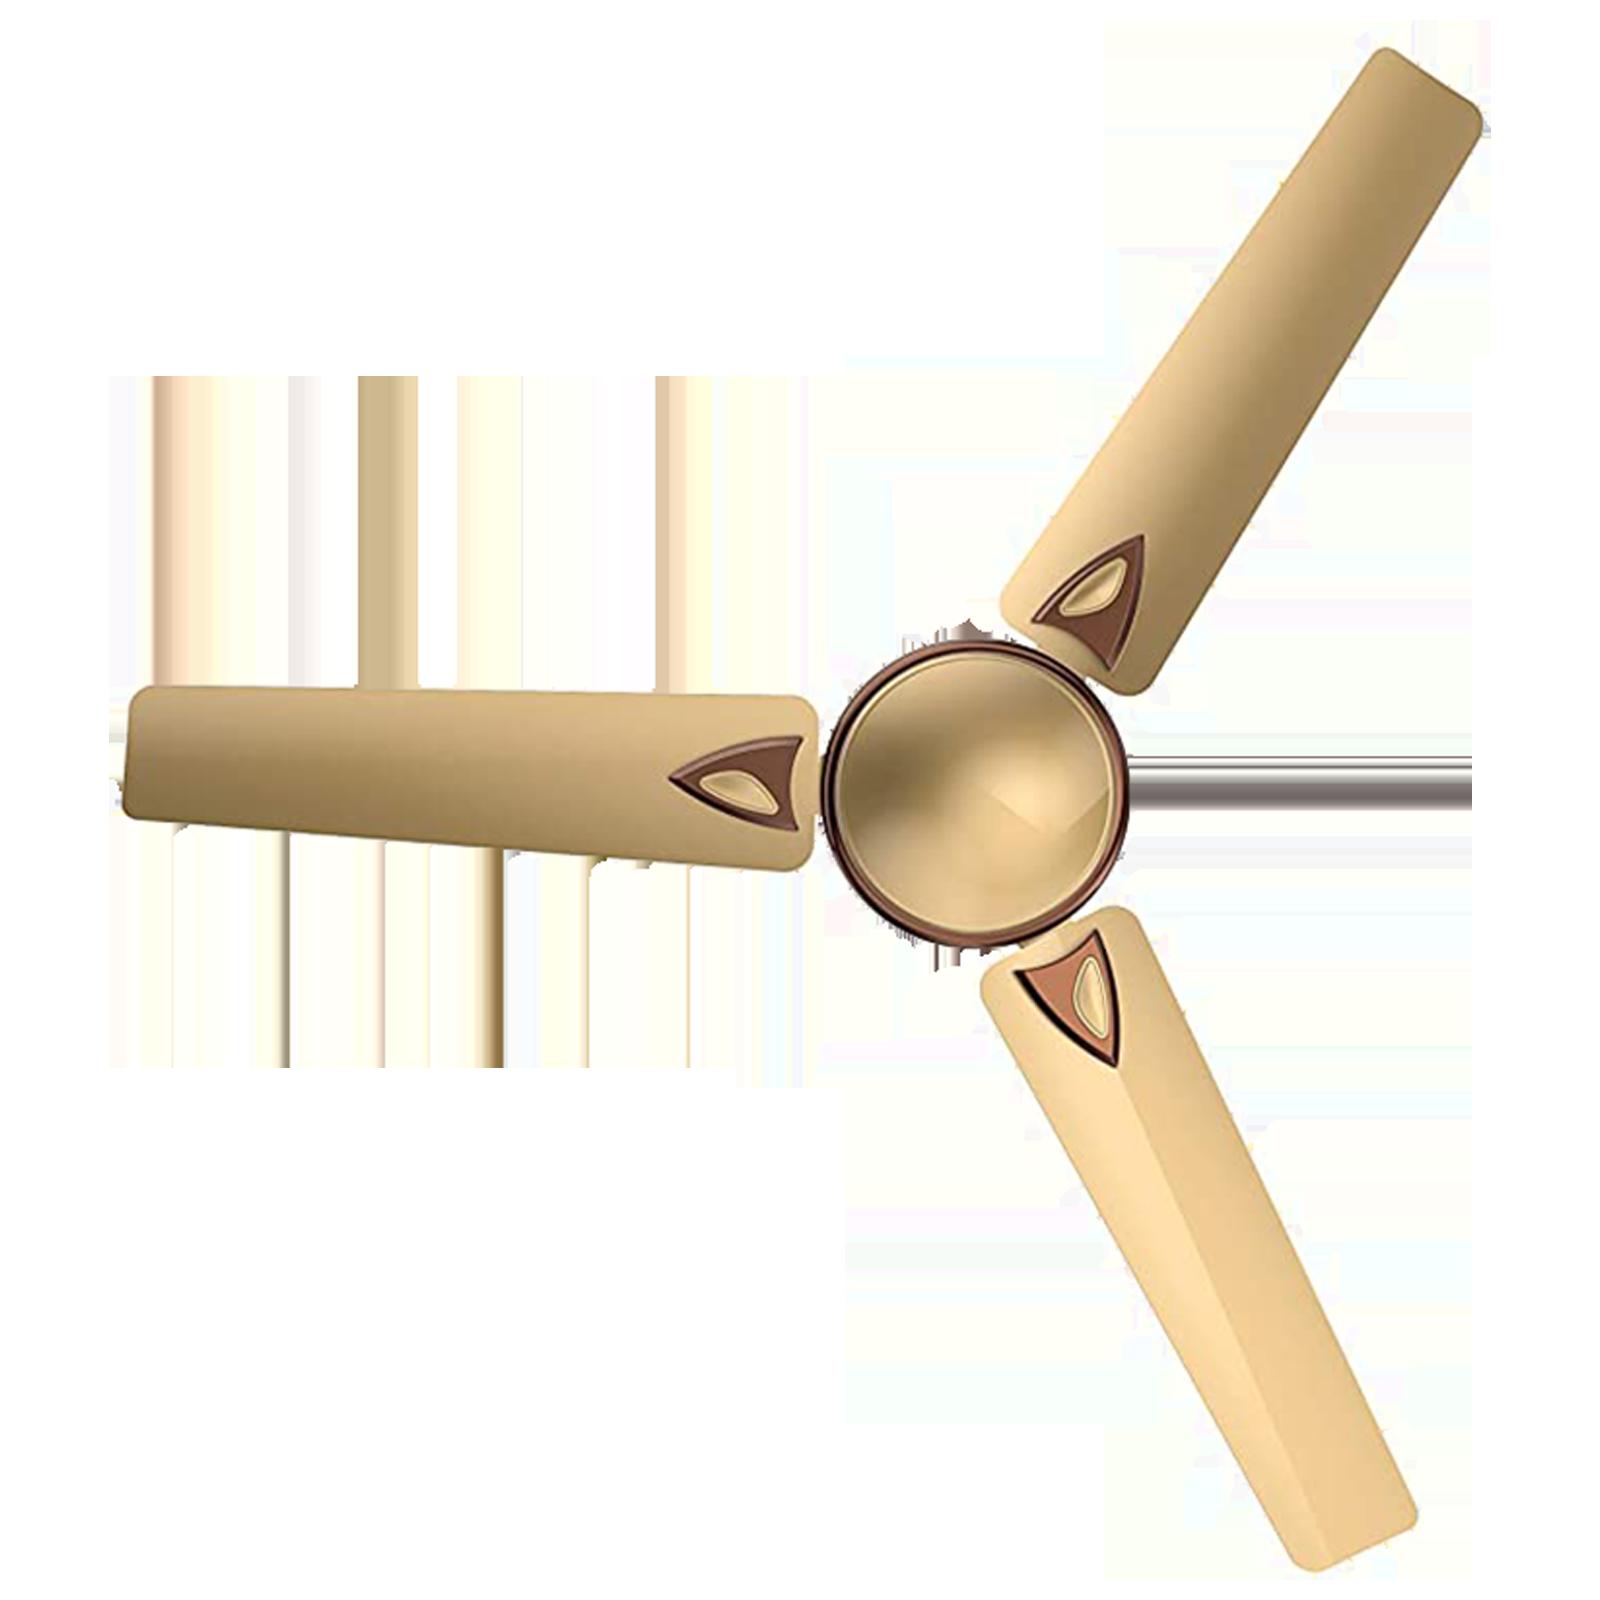 GM Nexa 120 cm Sweep 3 Blade Ceiling Fan (Aerodynamically Designed Blades, CFE480010GLMC, Gold)_1